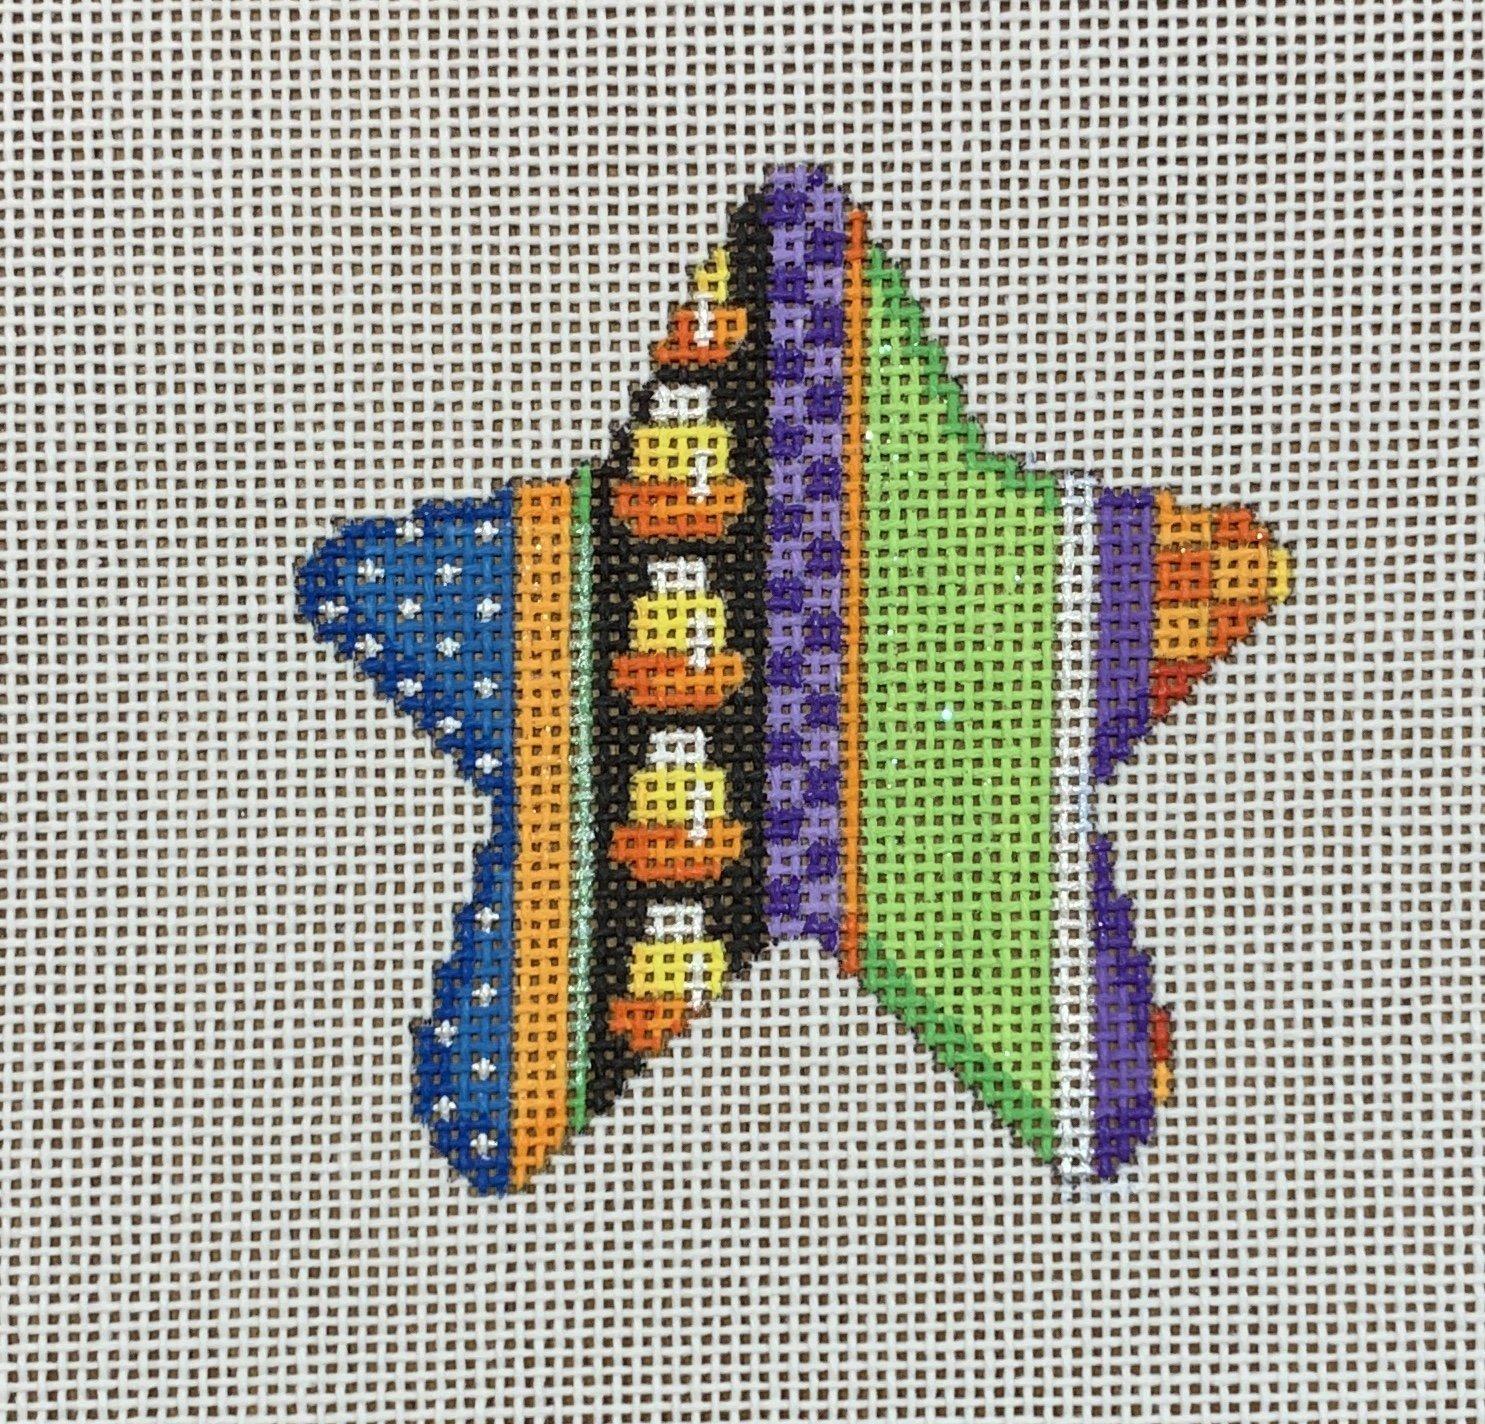 ATTSEE1405 Candy Corn Stripe Halloween Mini Star  3 x 3 18